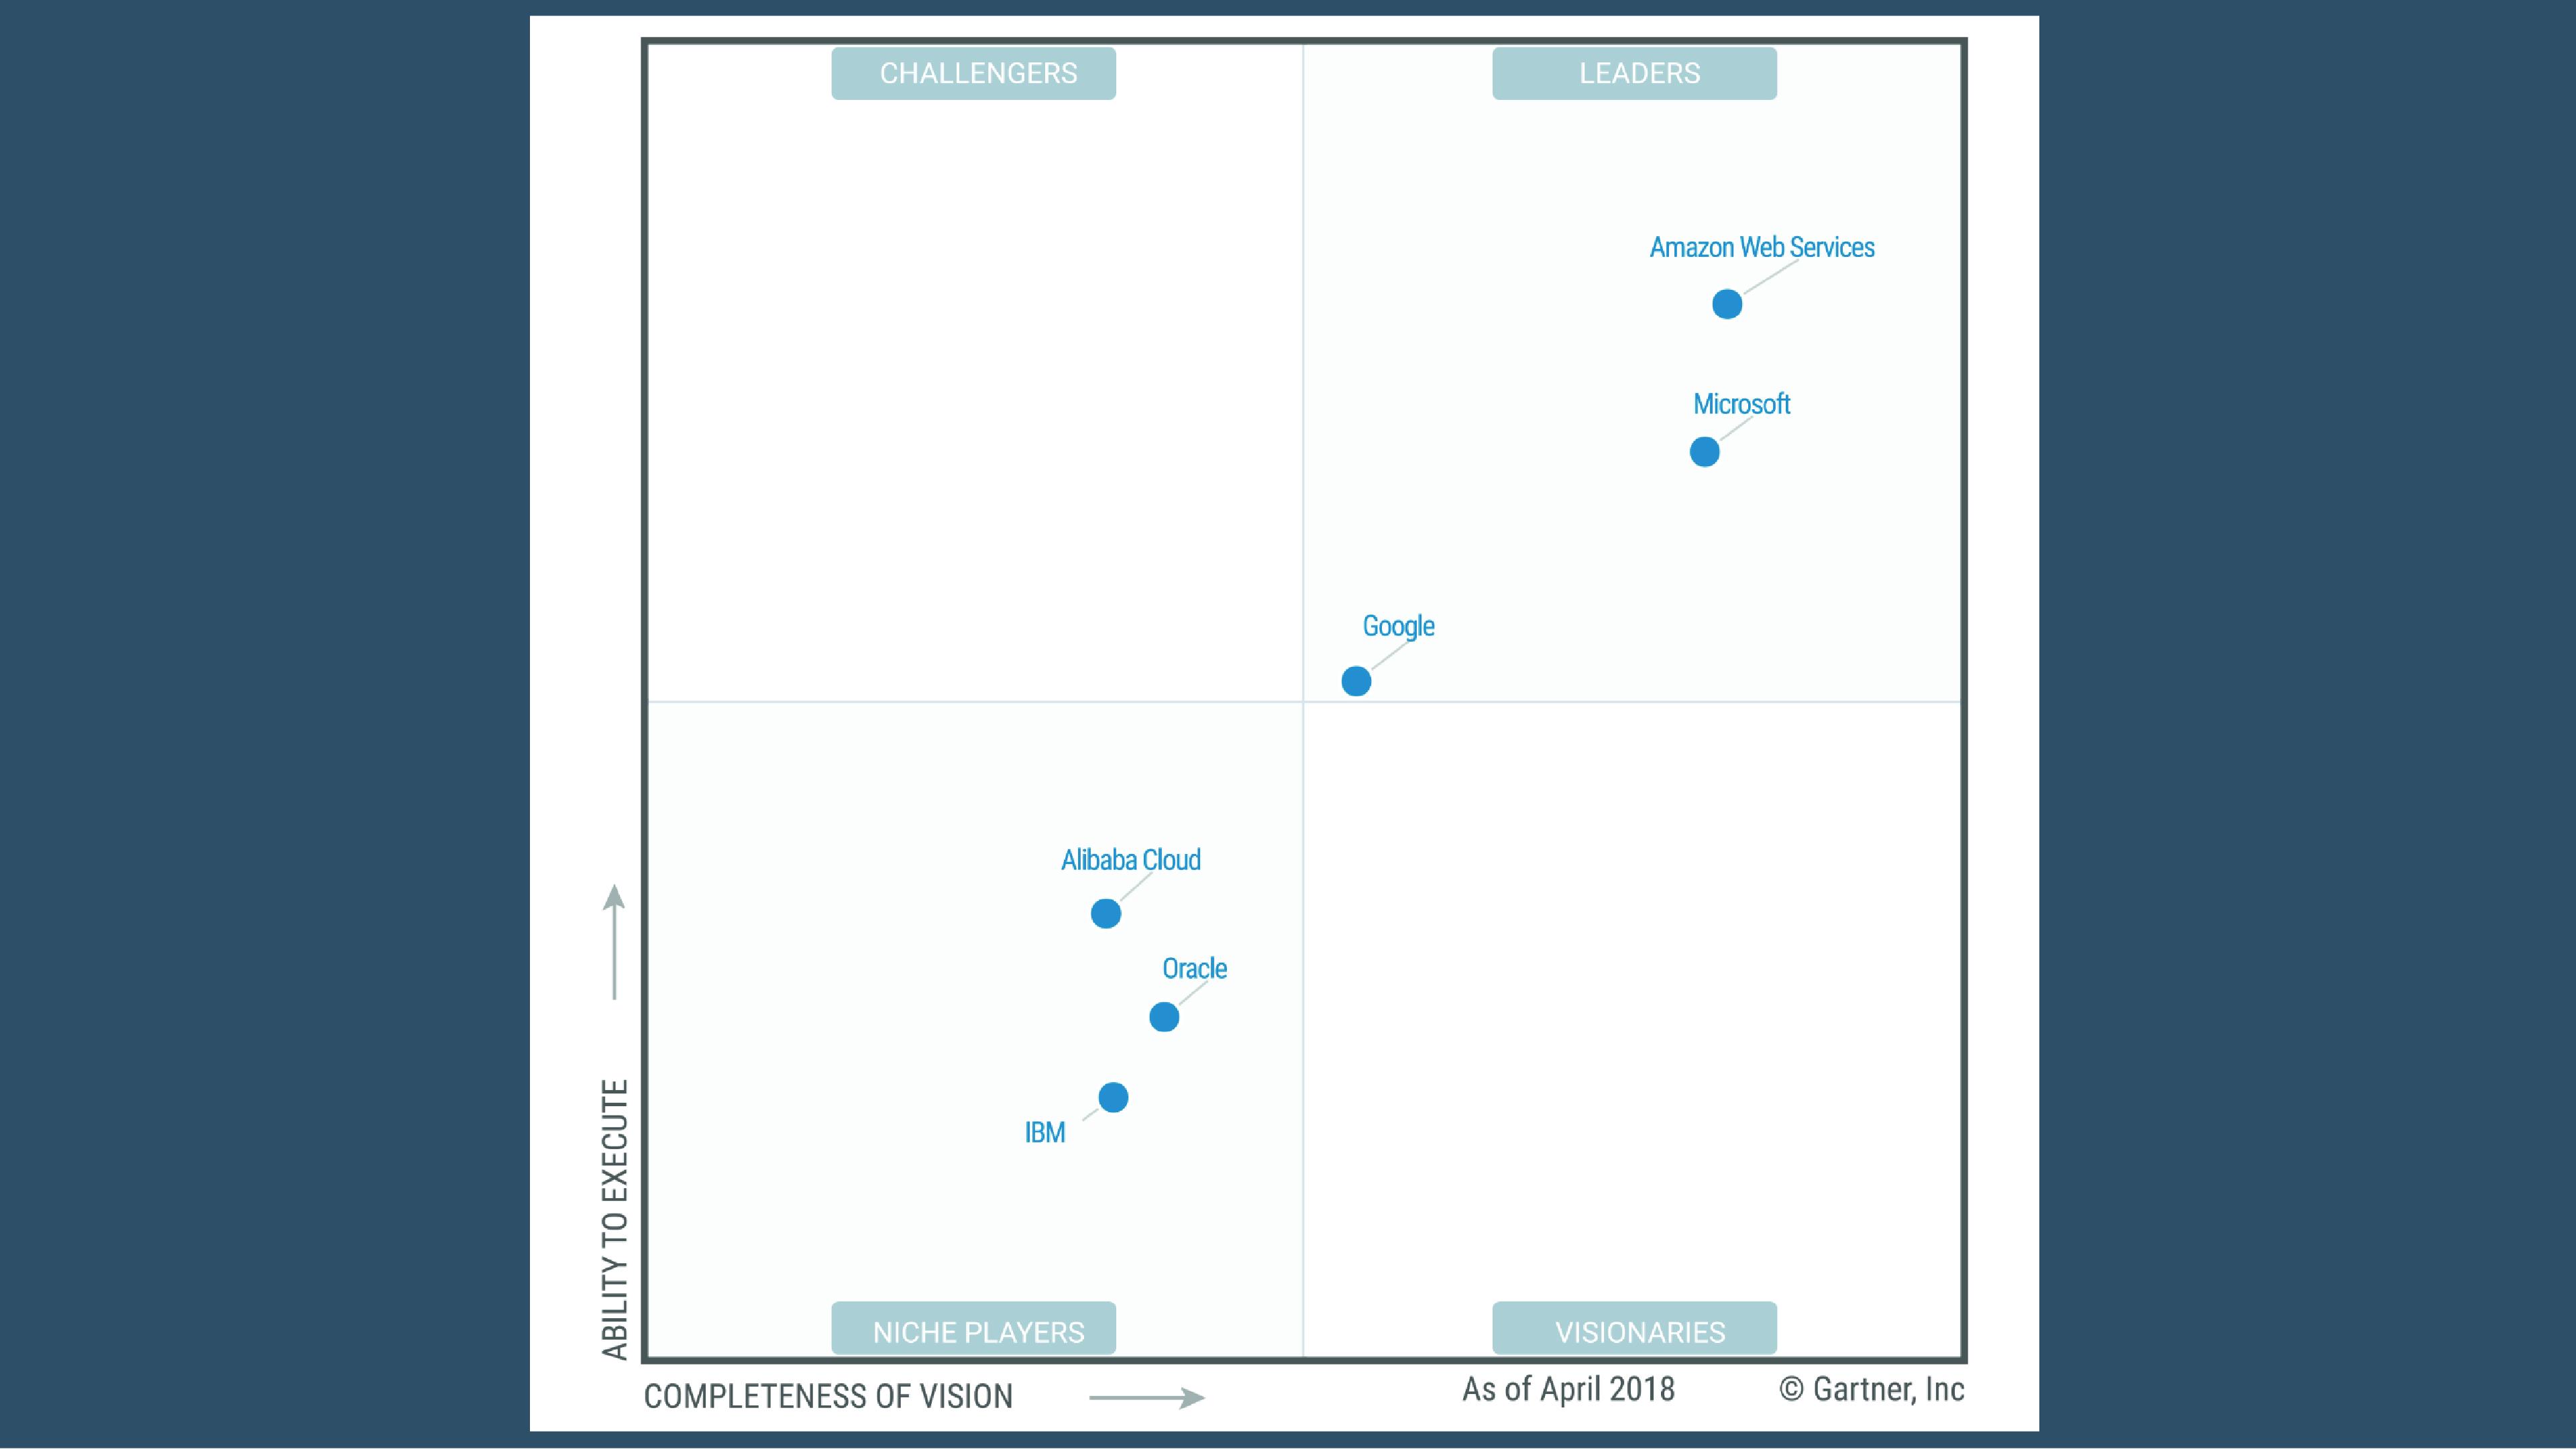 Gartner Magic Quadrant for Cloud Infrastructure as a Service